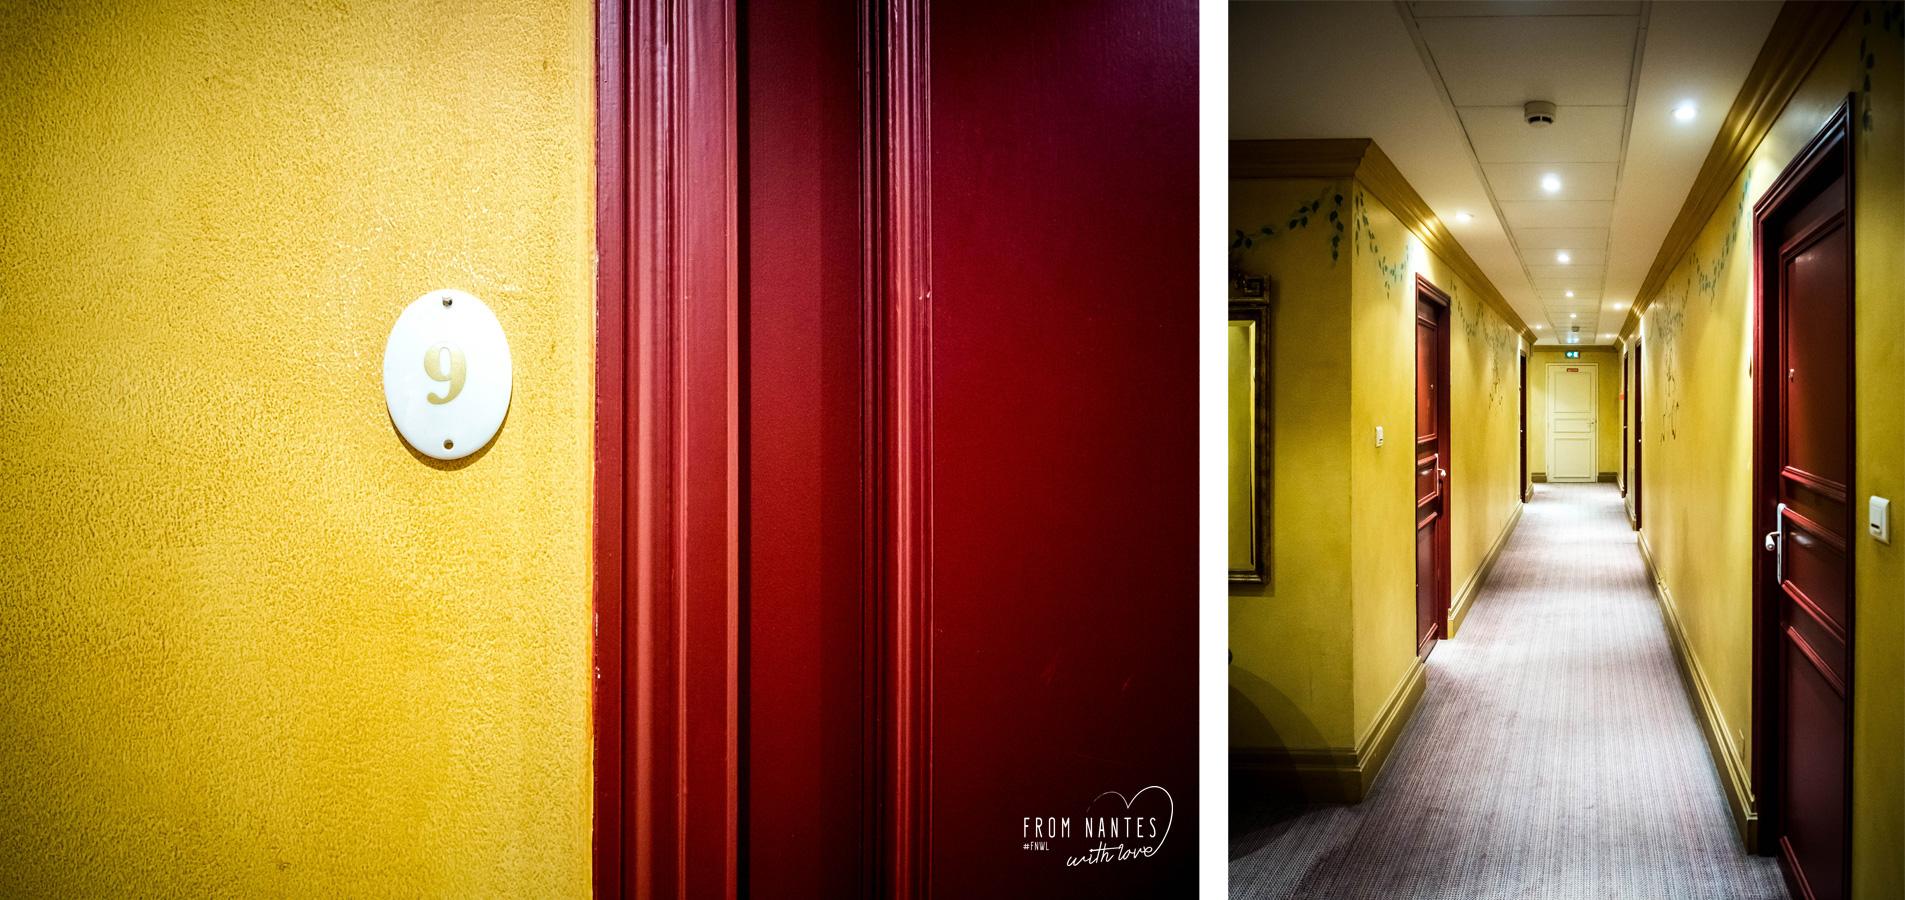 Cognac Hotel Restaurant l'Yeuse